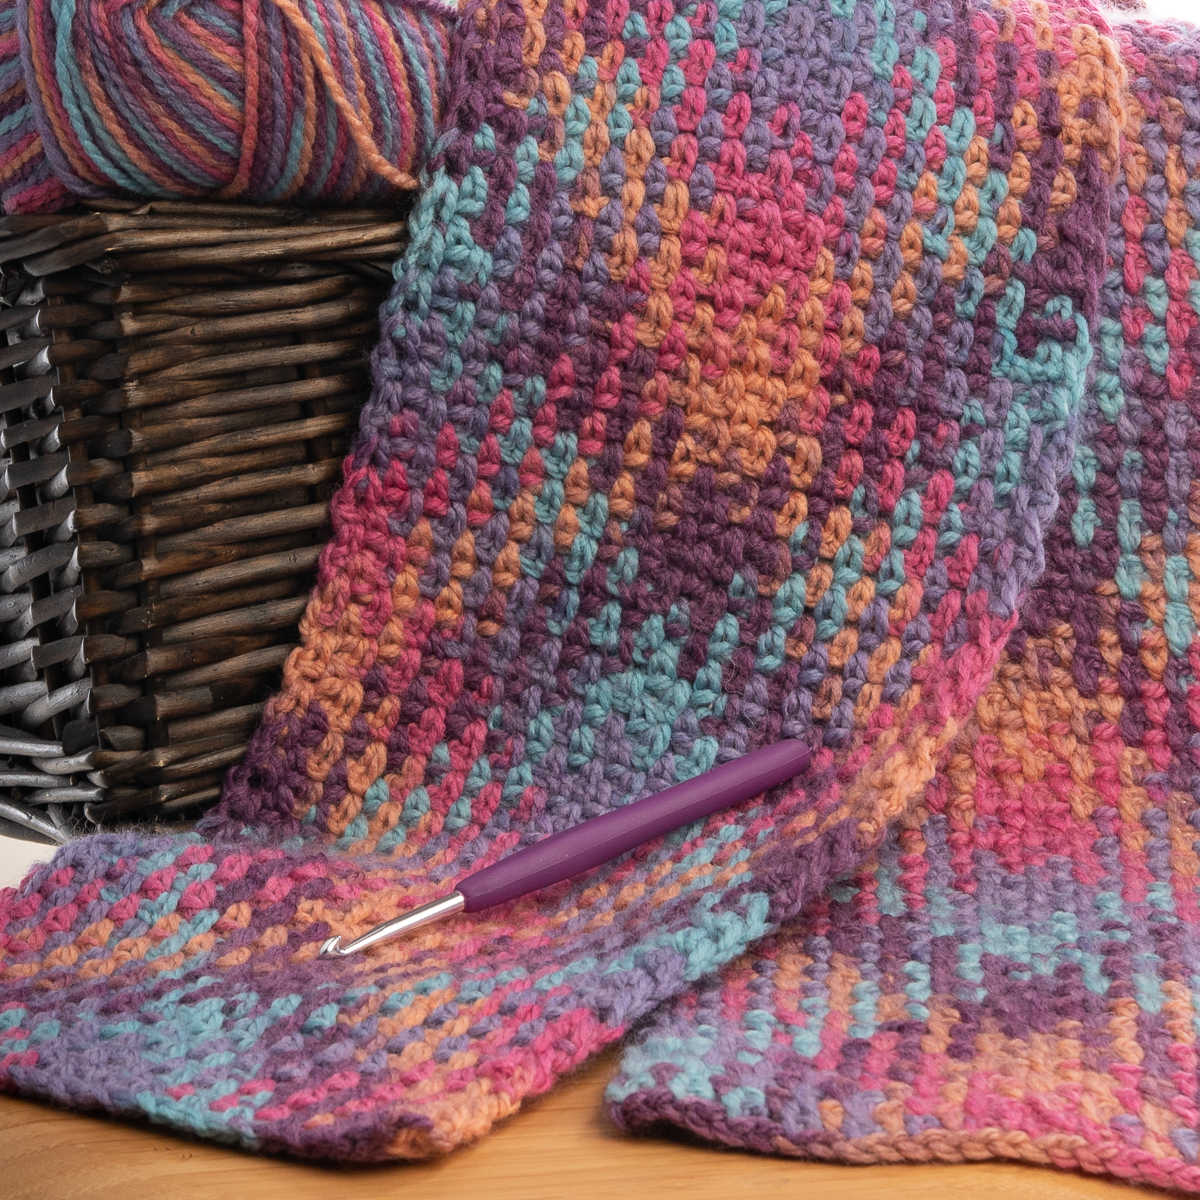 3pk-Lion-Brand-Color-Waves-Acrylic-amp-Wool-Yarn-Light-3-Soft-Knitting-Crocheting thumbnail 30